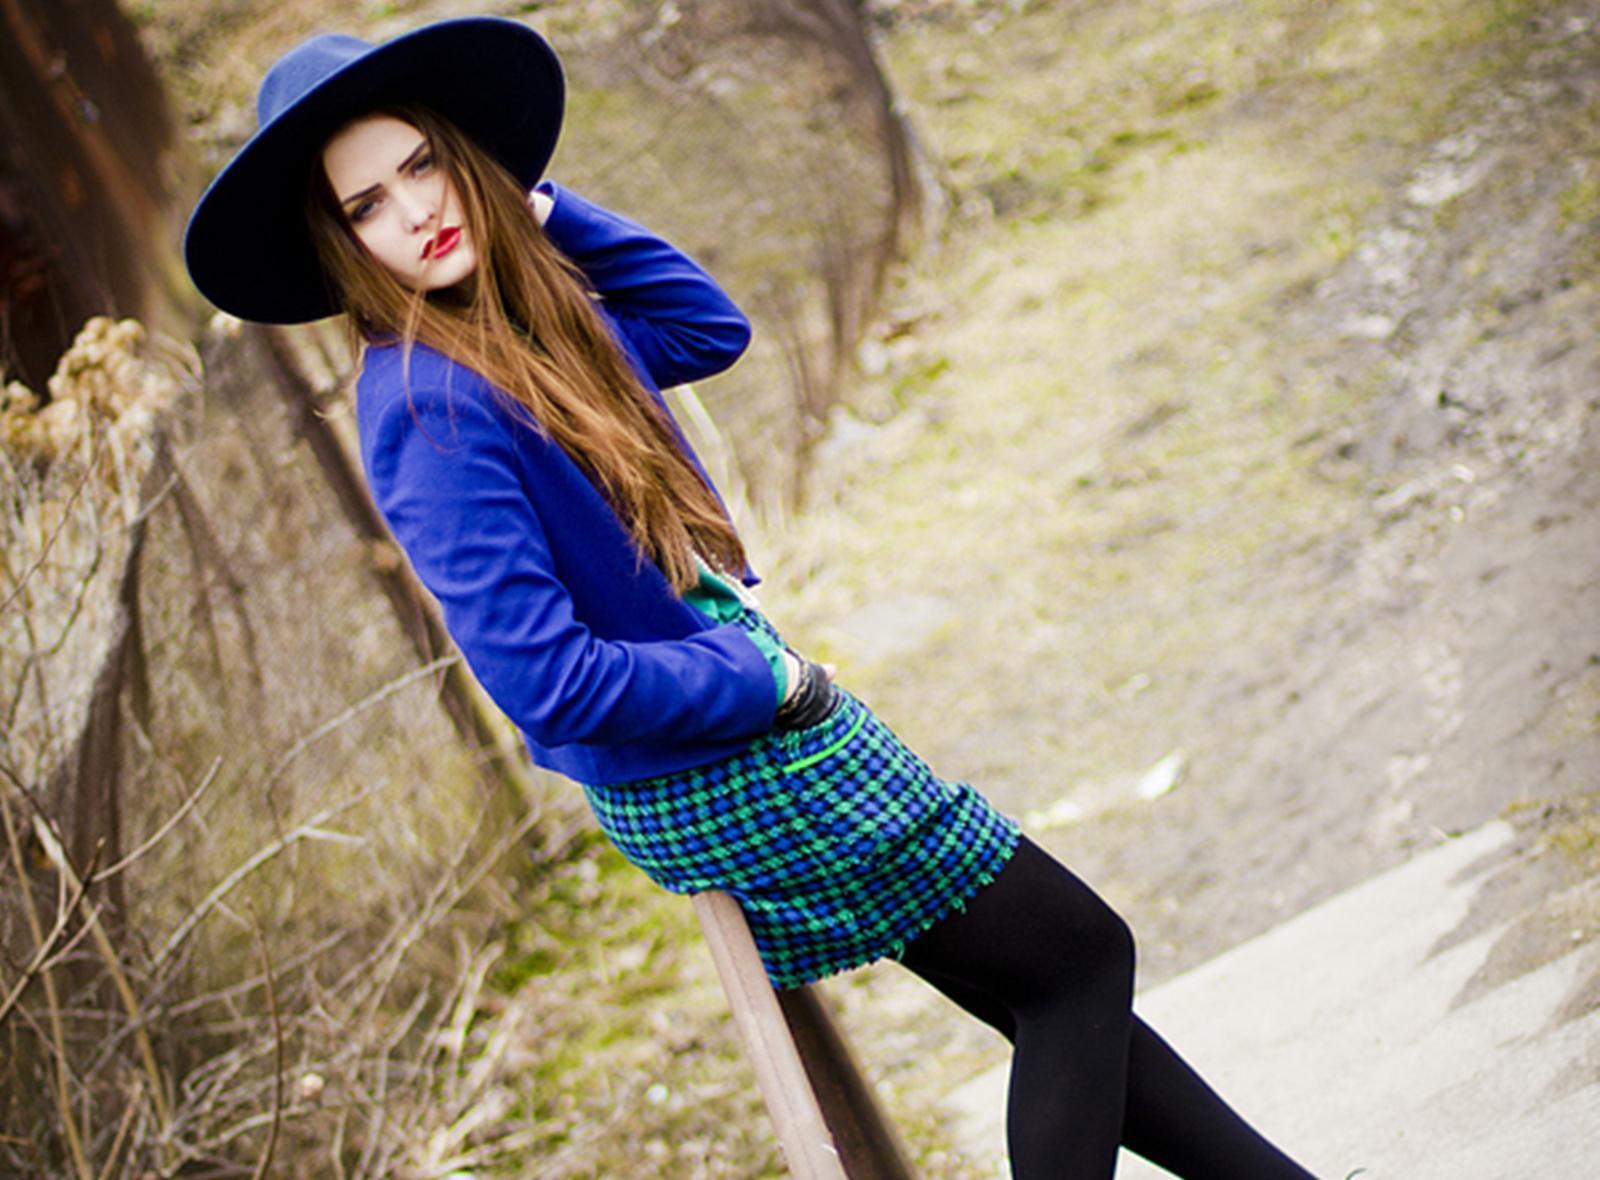 blue_fashion-1474215